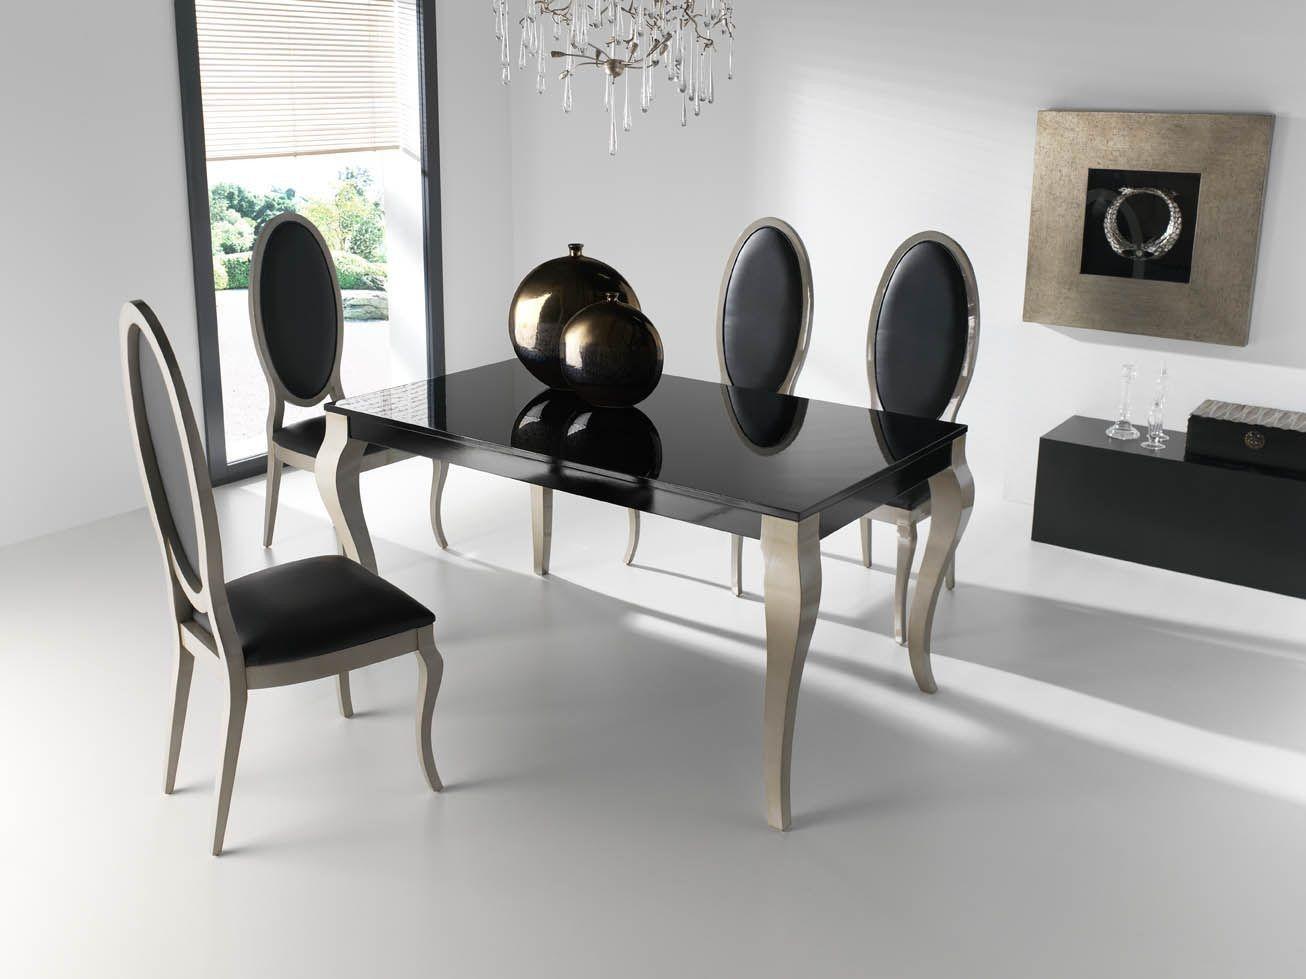 Mesa comedor moderna laca negra chipendale decoraci n for Mesa comedor negra